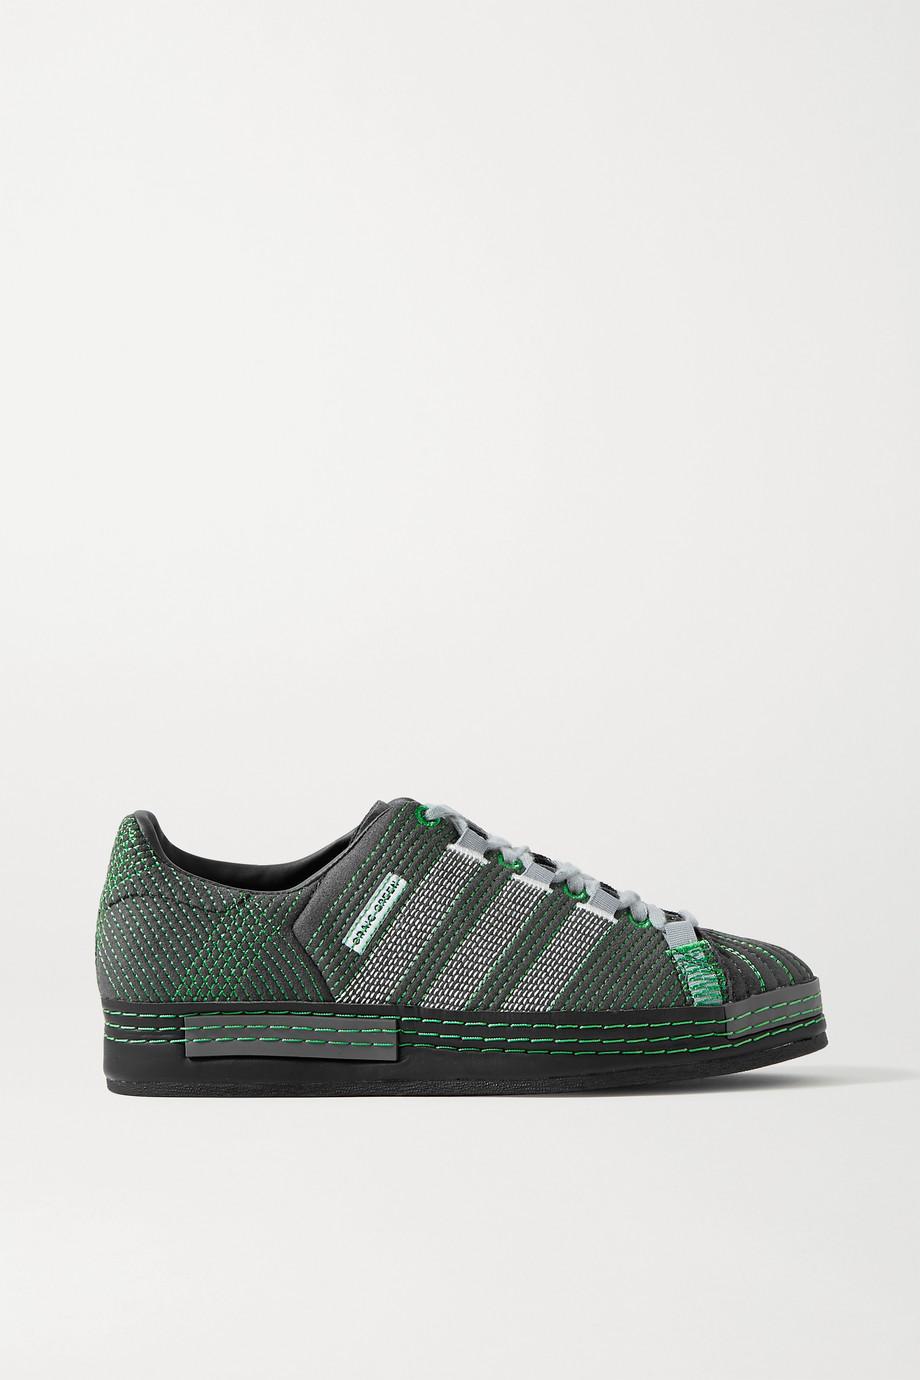 adidas Originals + Craig Green Superstar embroidered suede sneakers